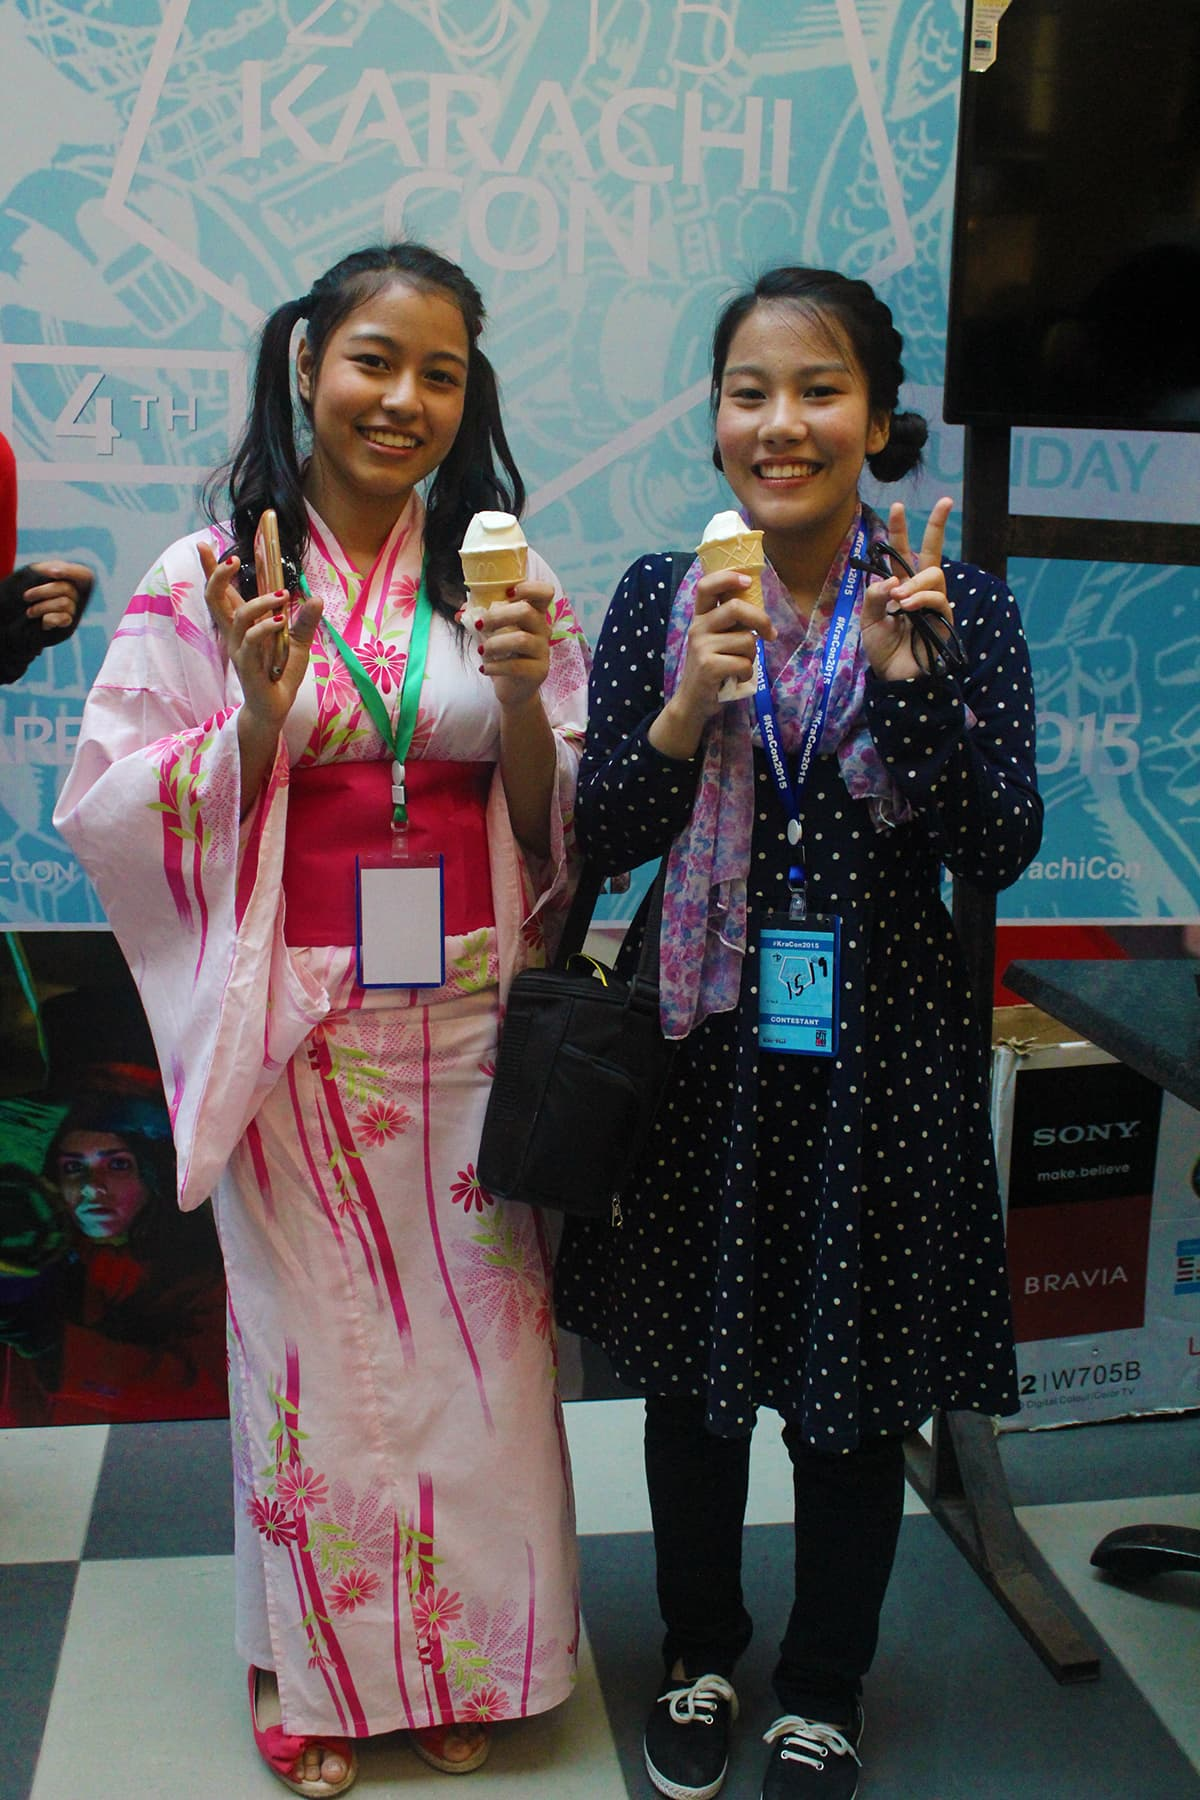 Mew Ichigo (left) from Tokyo Mew Mew. — Photo: Azmeena Alidina